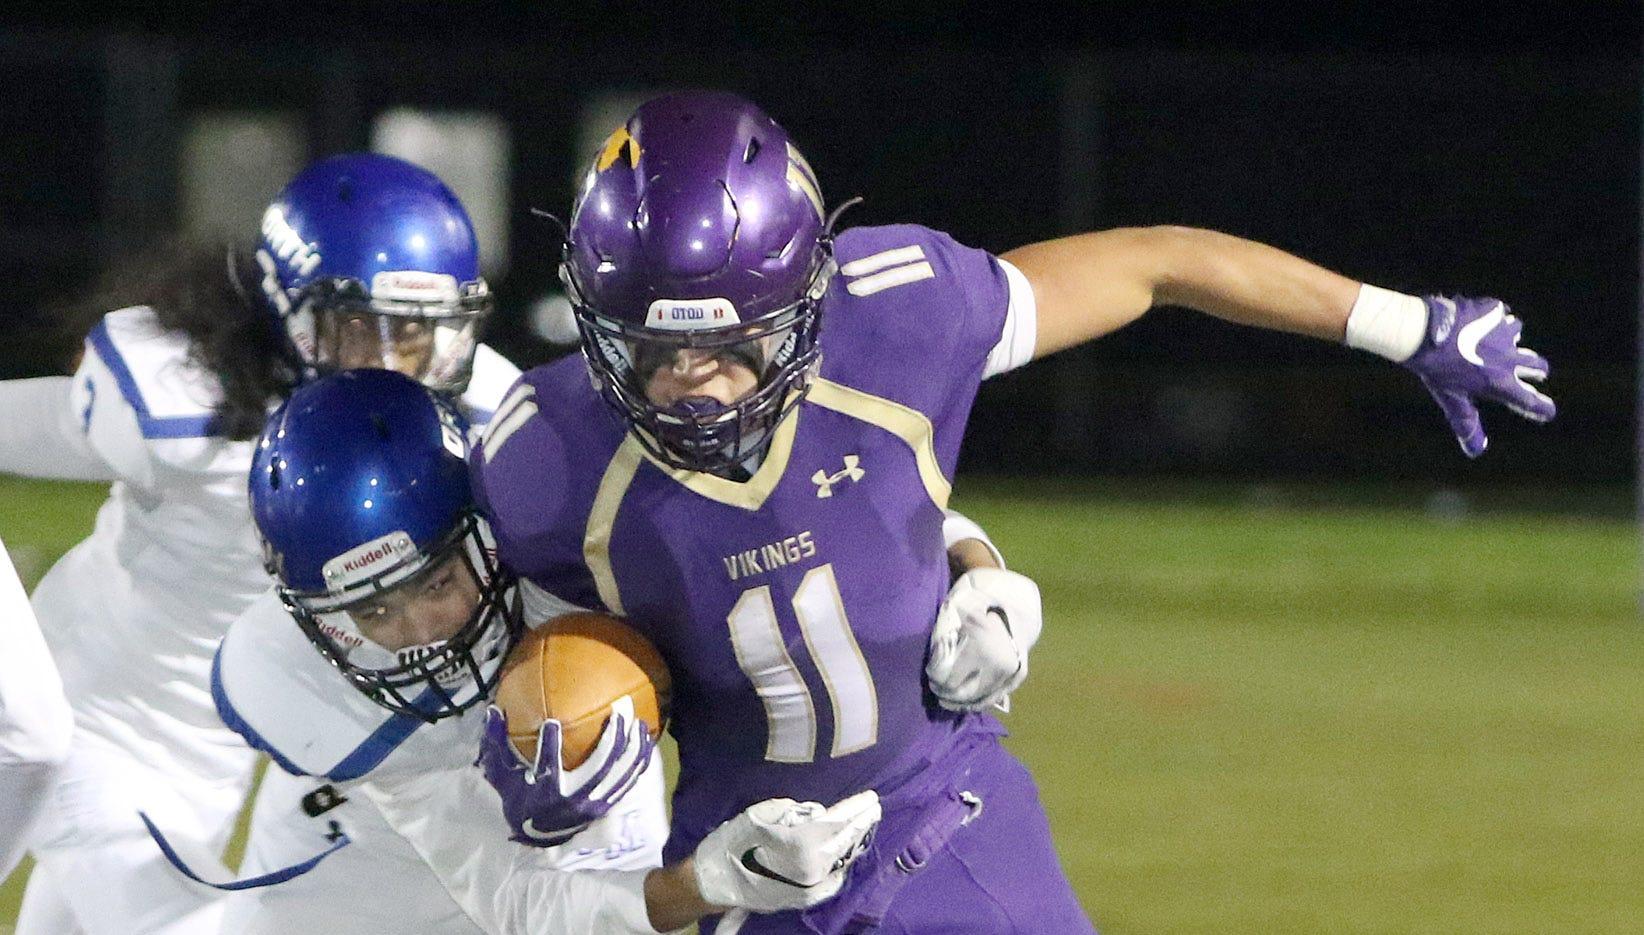 John Jones scored four touchdowns in North Kitsap's 53-6 win over North Mason on Friday.